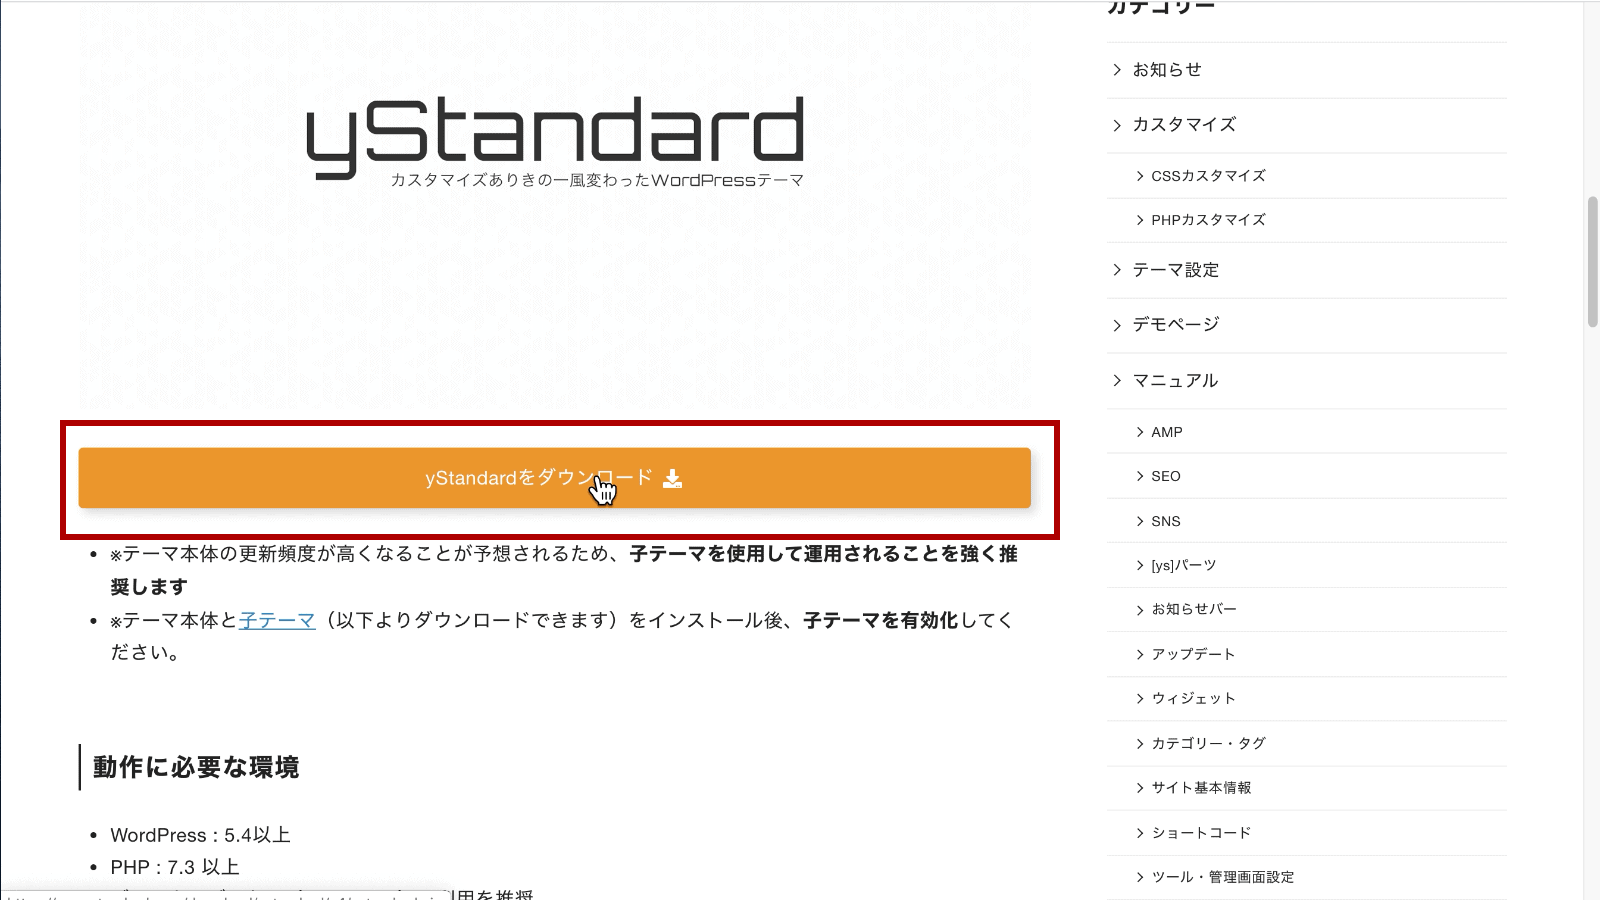 yStandardをダウンロード